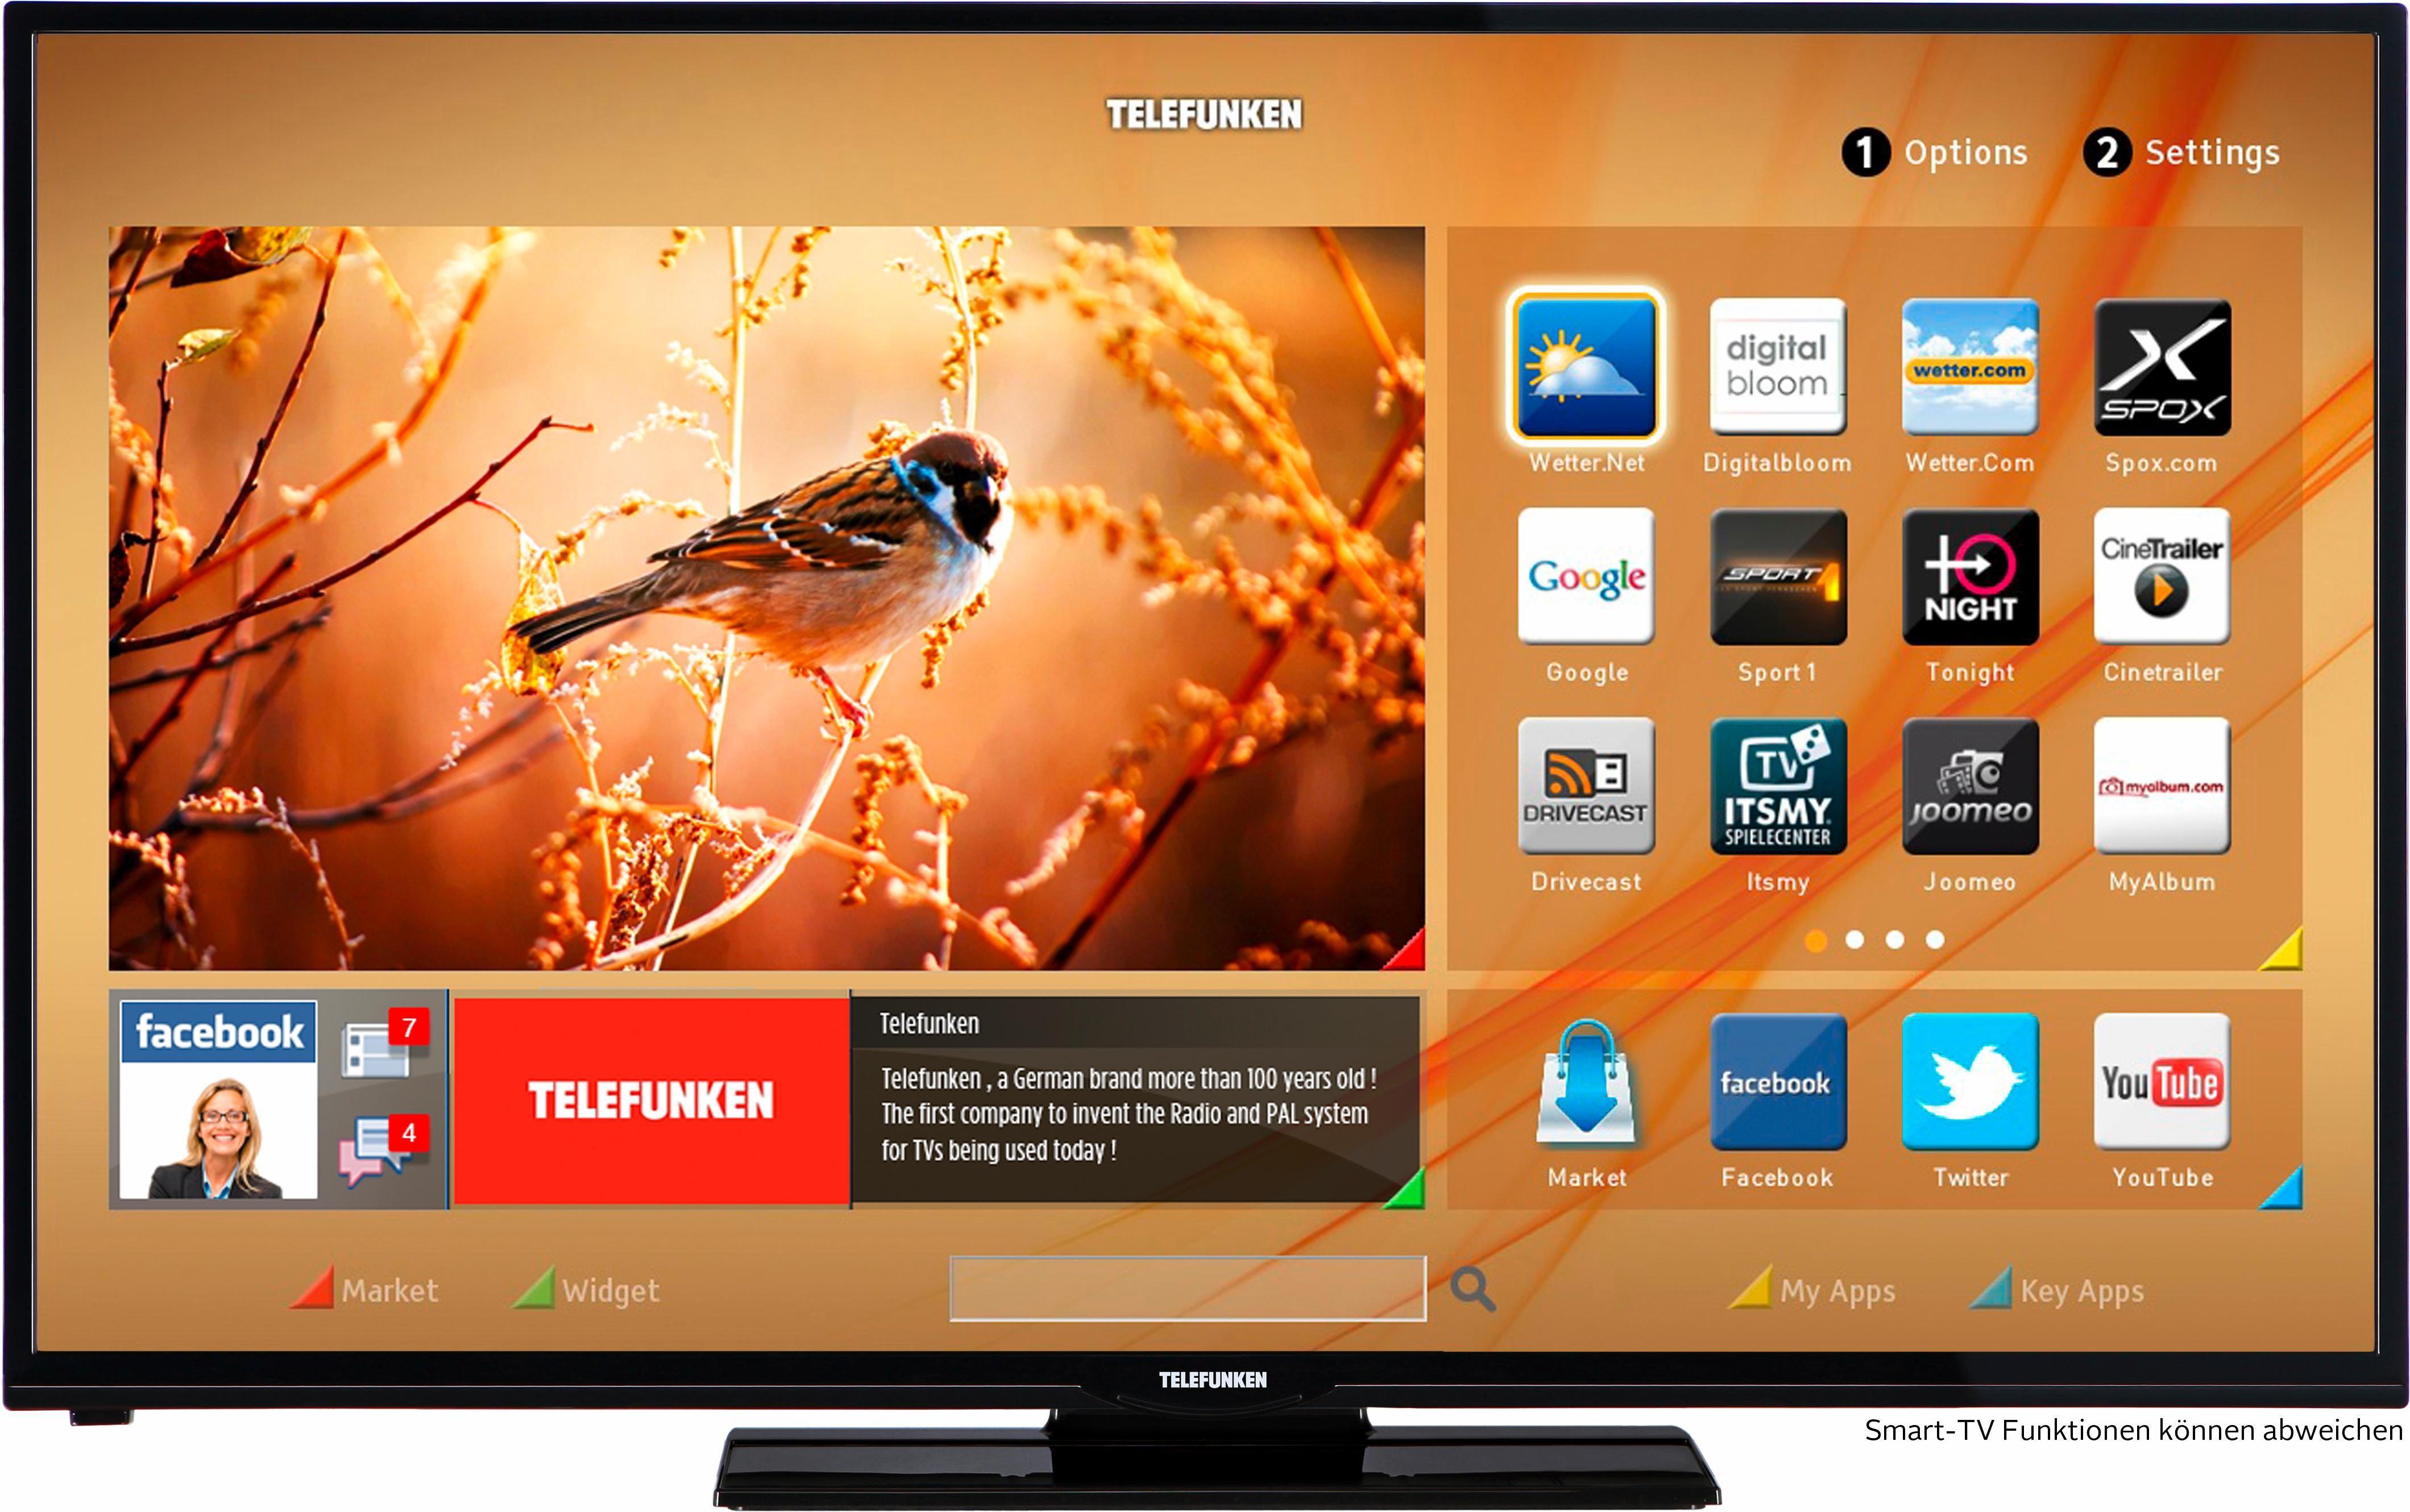 Telefunken D50F275N3CW, LED Fernseher, 127 cm (50 Zoll), 1080p (Full HD), Smart-TV